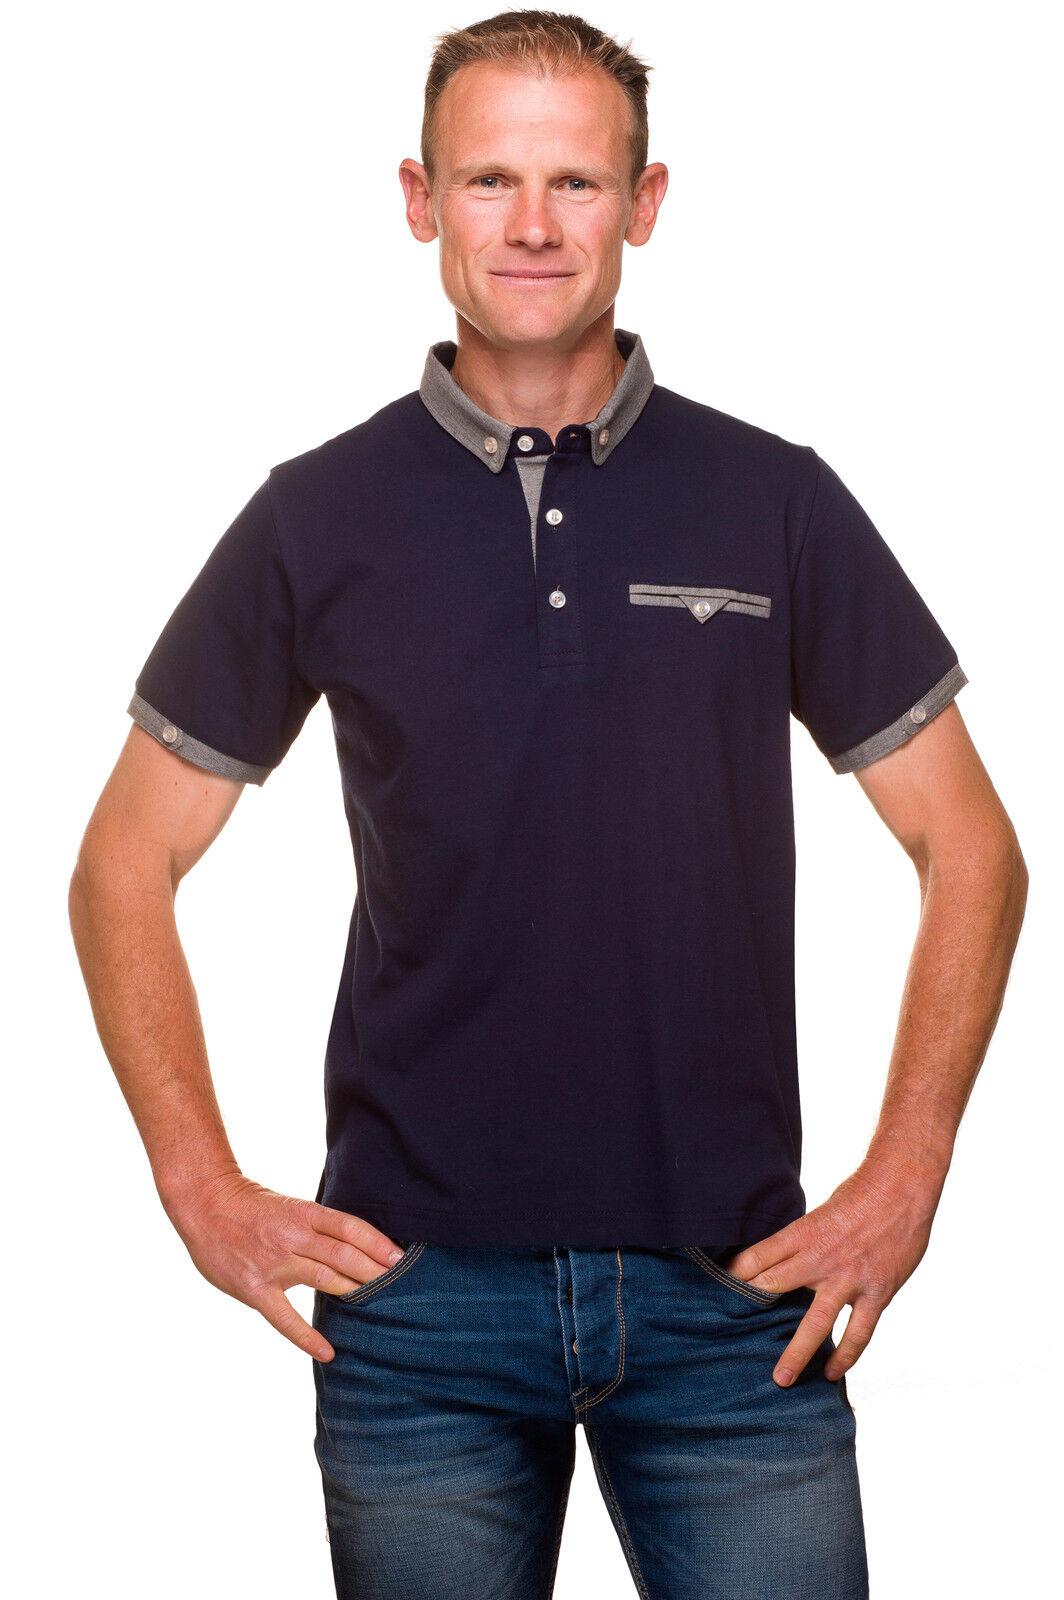 Ugholin Men's Plain Cotton Slim Fit Short Sleeve Navy bluee Polo Shirt